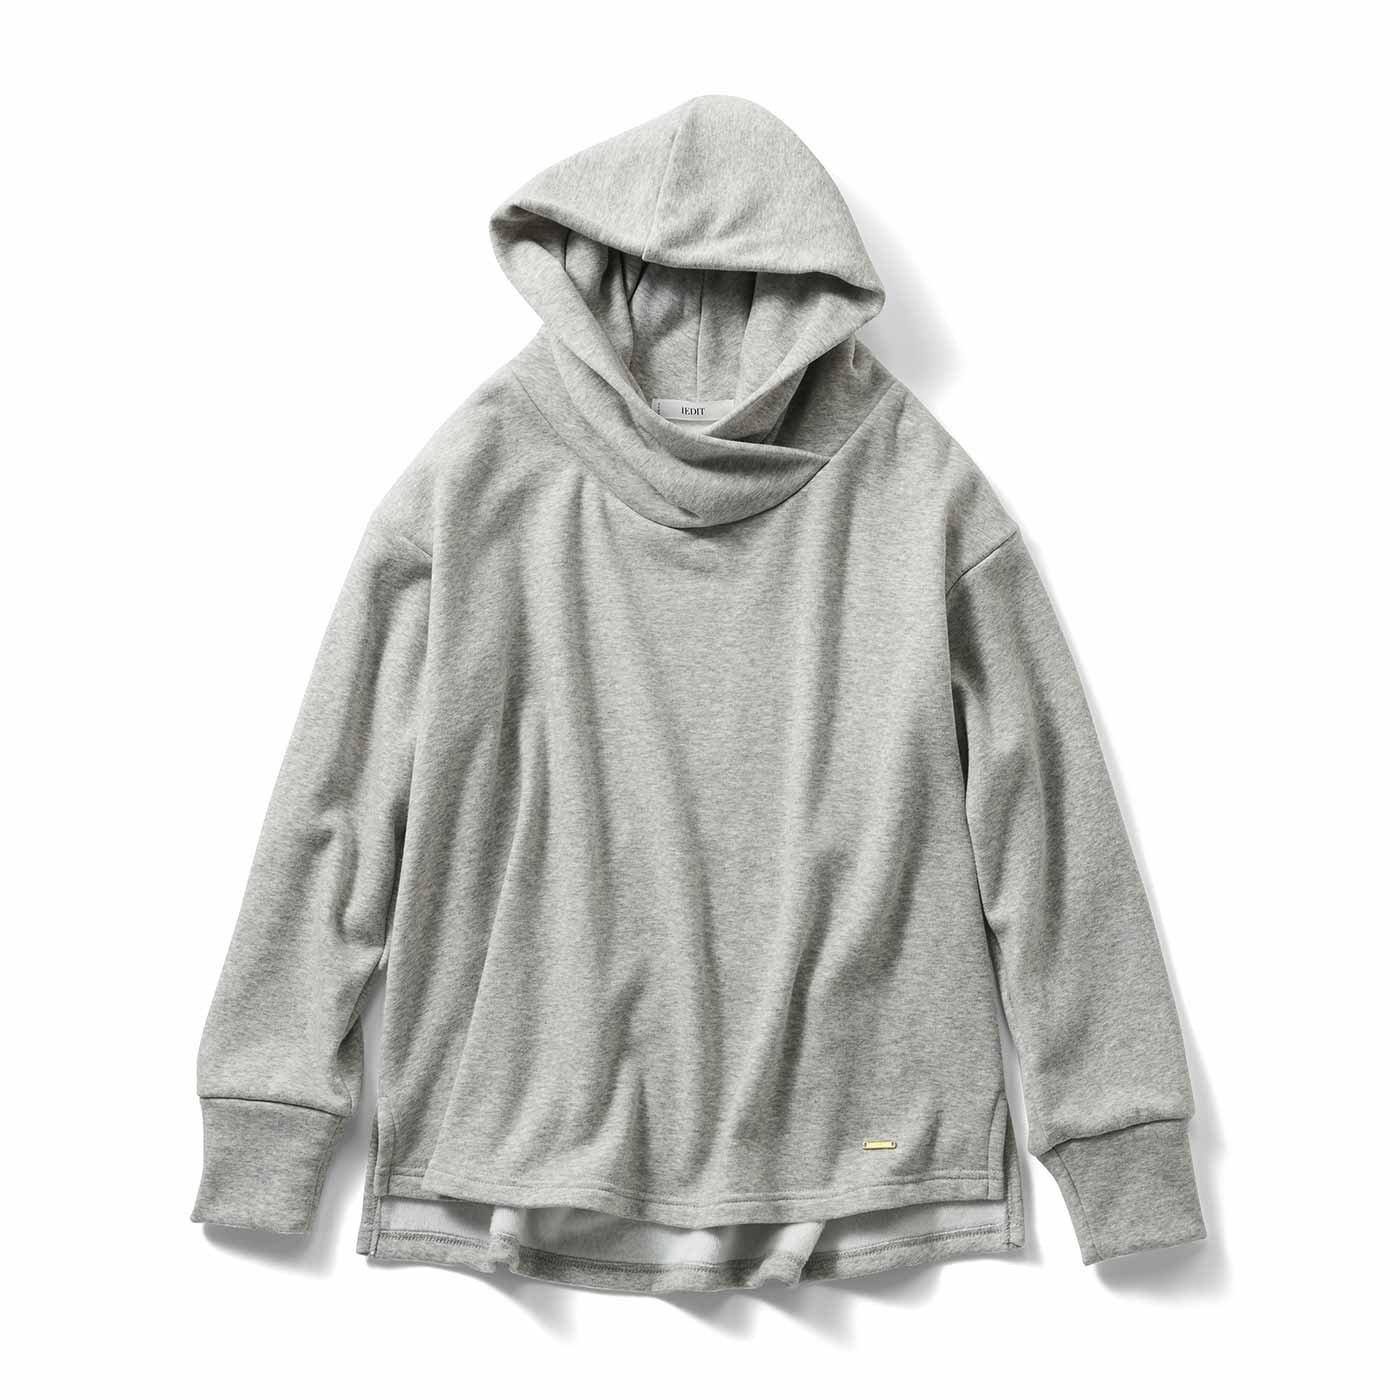 IEDIT[イディット] 裏シャギー素材が暖かい 衿高フードの小顔見えパーカー〈杢(もく)グレー〉